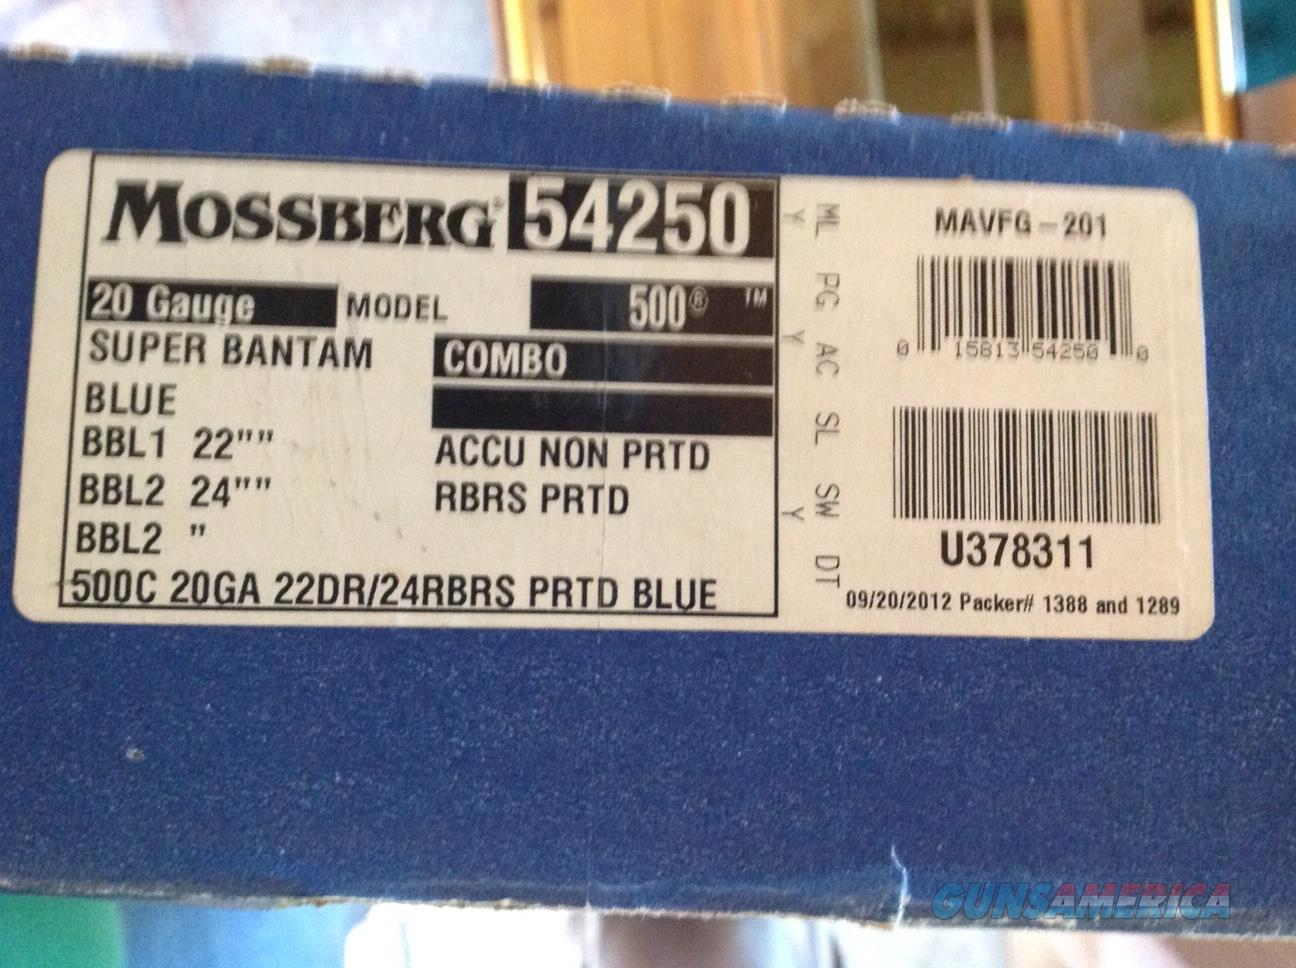 Mossberg 500 Super Bantam Combo #54250  Guns > Shotguns > Mossberg Shotguns > Pump > Sporting